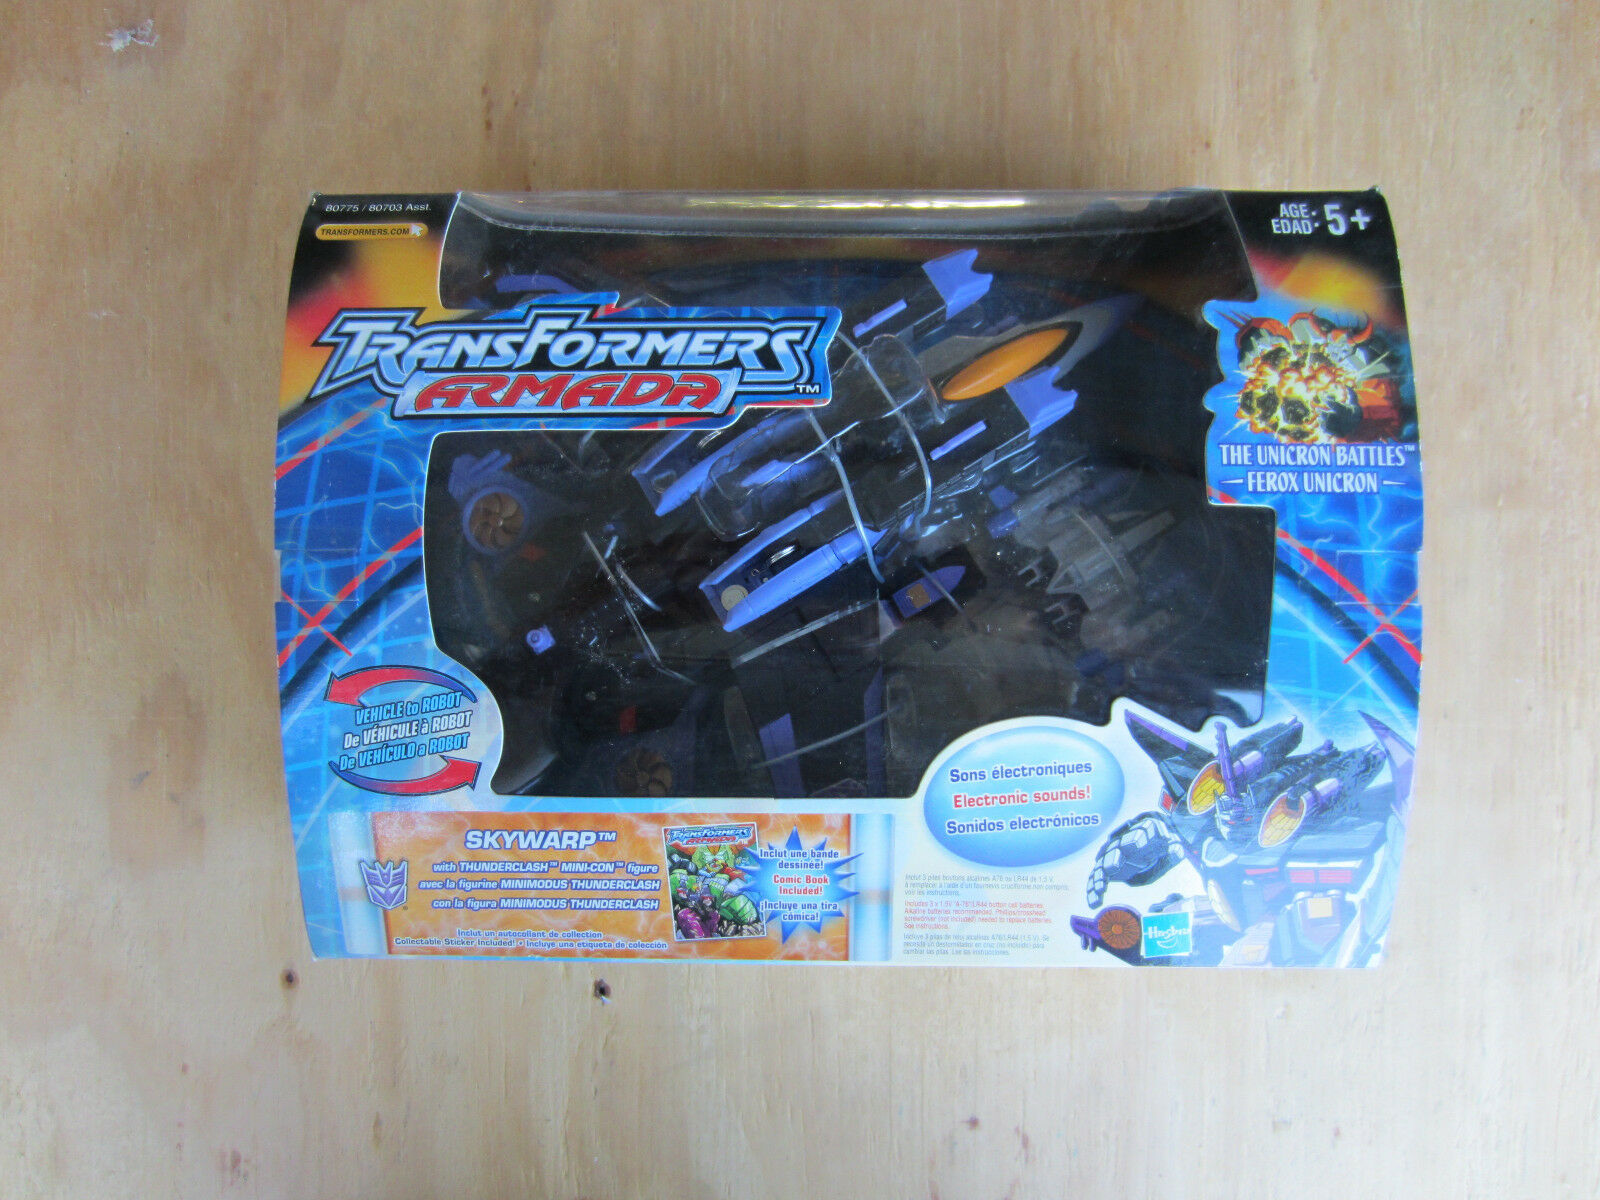 Transformers 2003 Action Figure Armada Skywarp+ mini-con and Comic Book MISB new